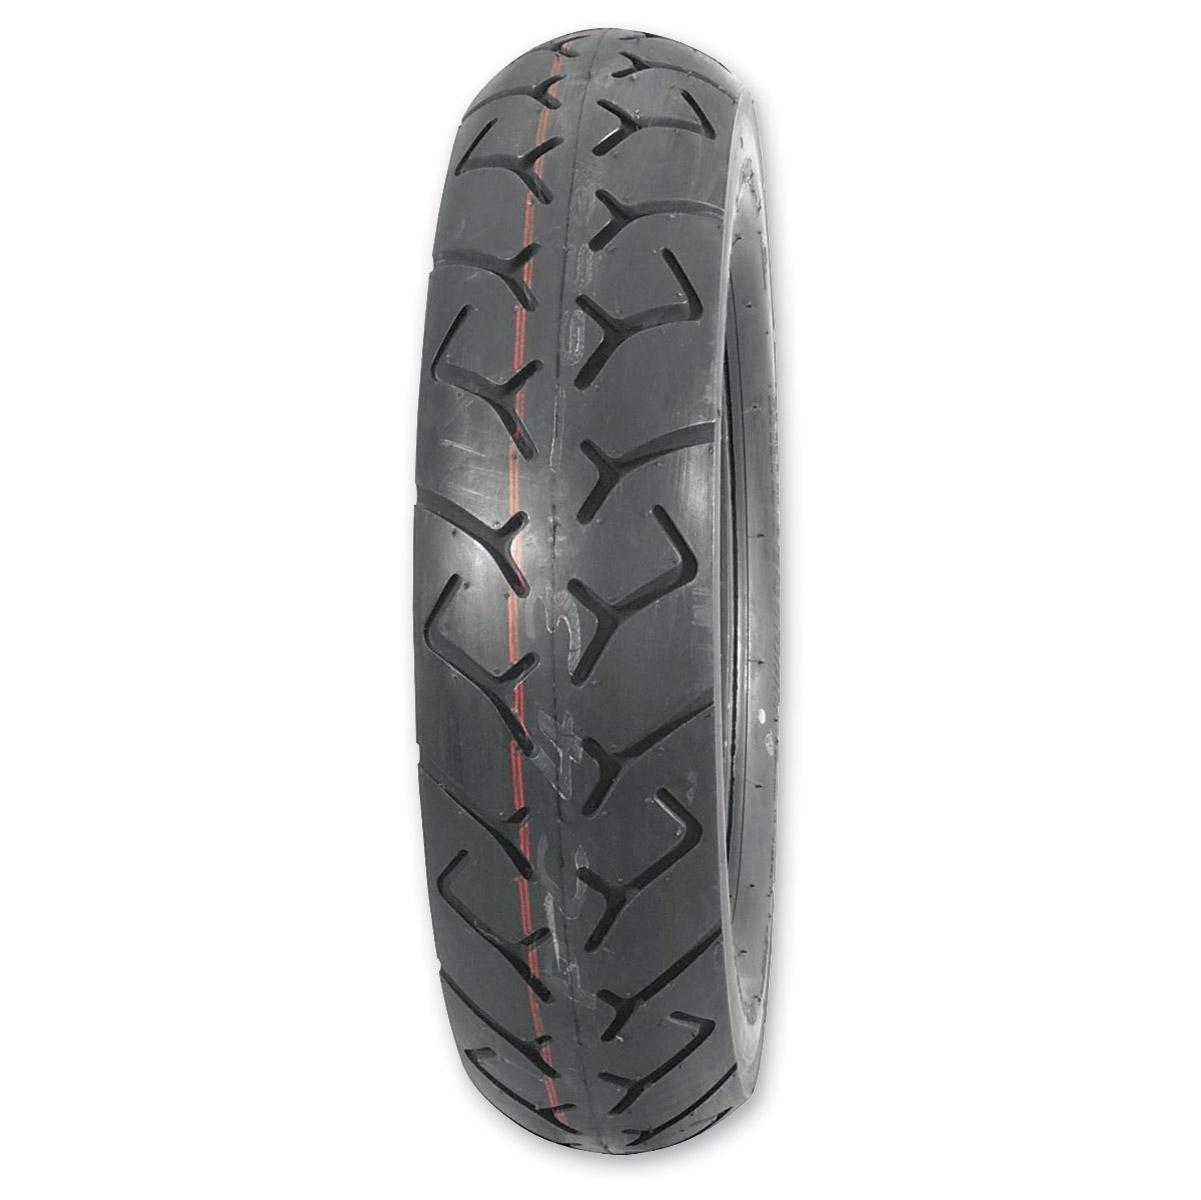 79V Exedra Max Rear Motorcycle Tire for Moto Guzzi Bridgestone 200//60R-16